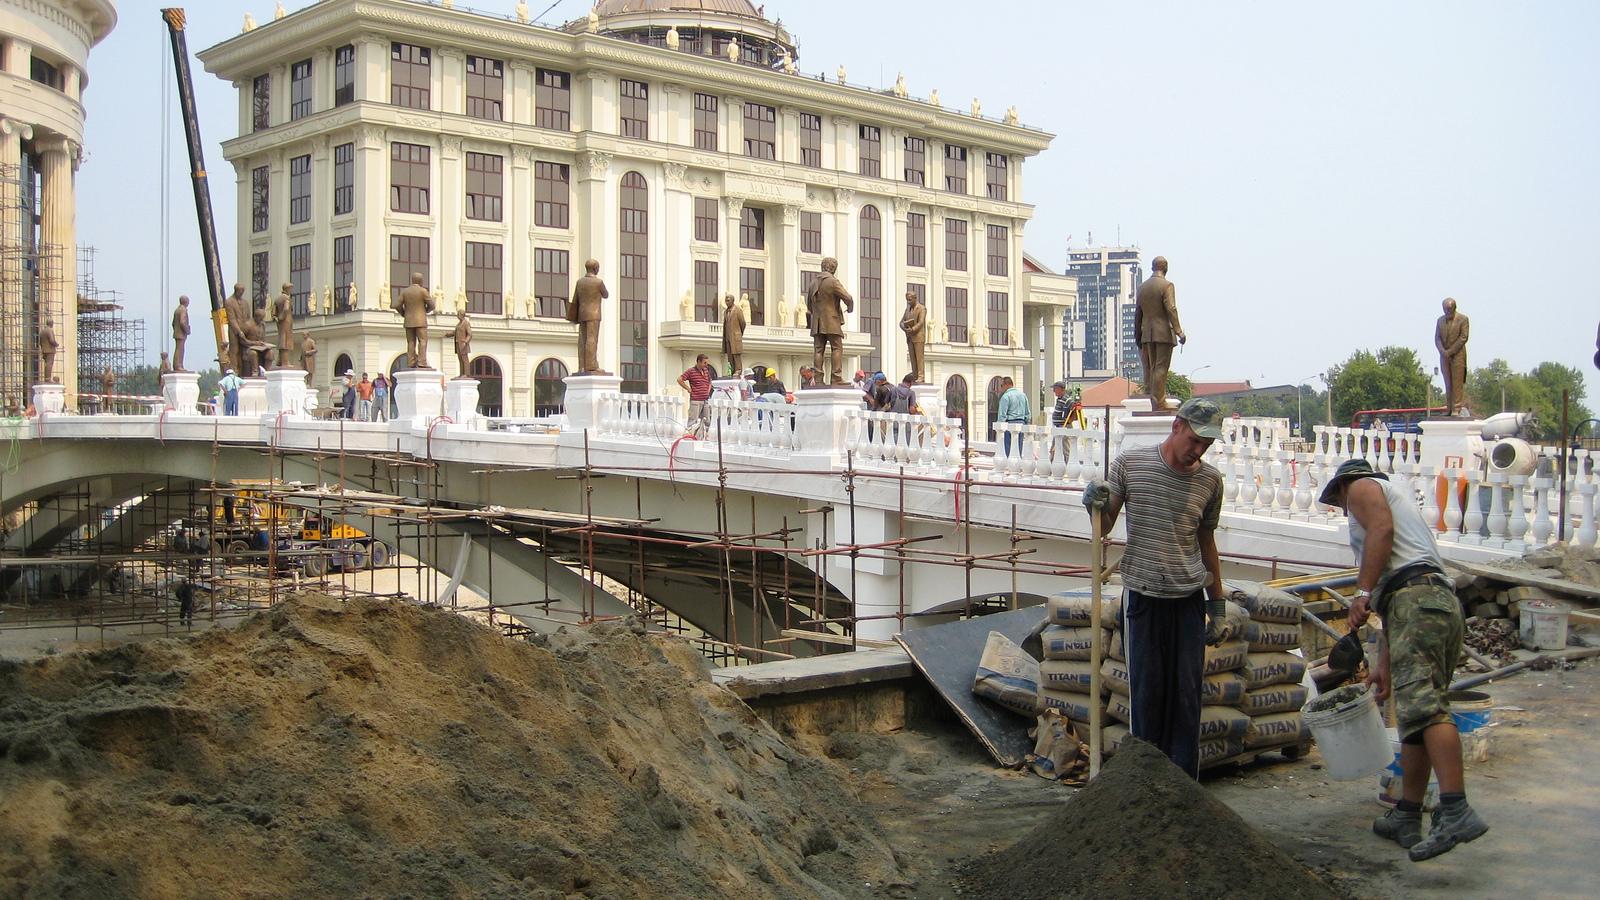 Шпанските скали стопирани  Панорамско тркало сепак ќе се гради